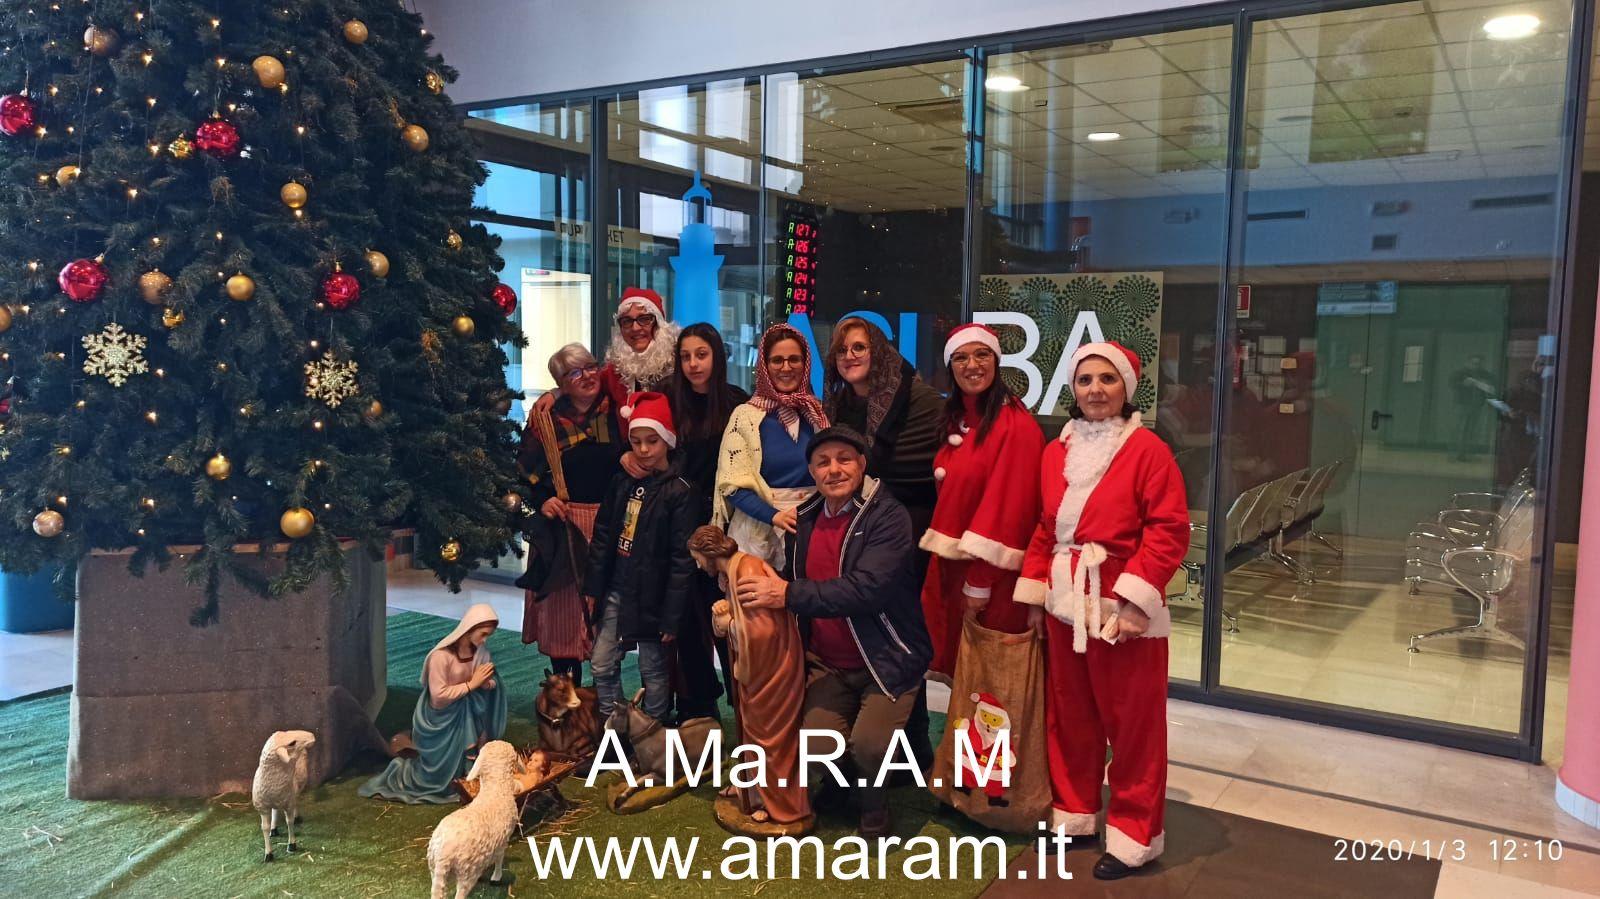 Amaram-Onlus-03-01-2020-2